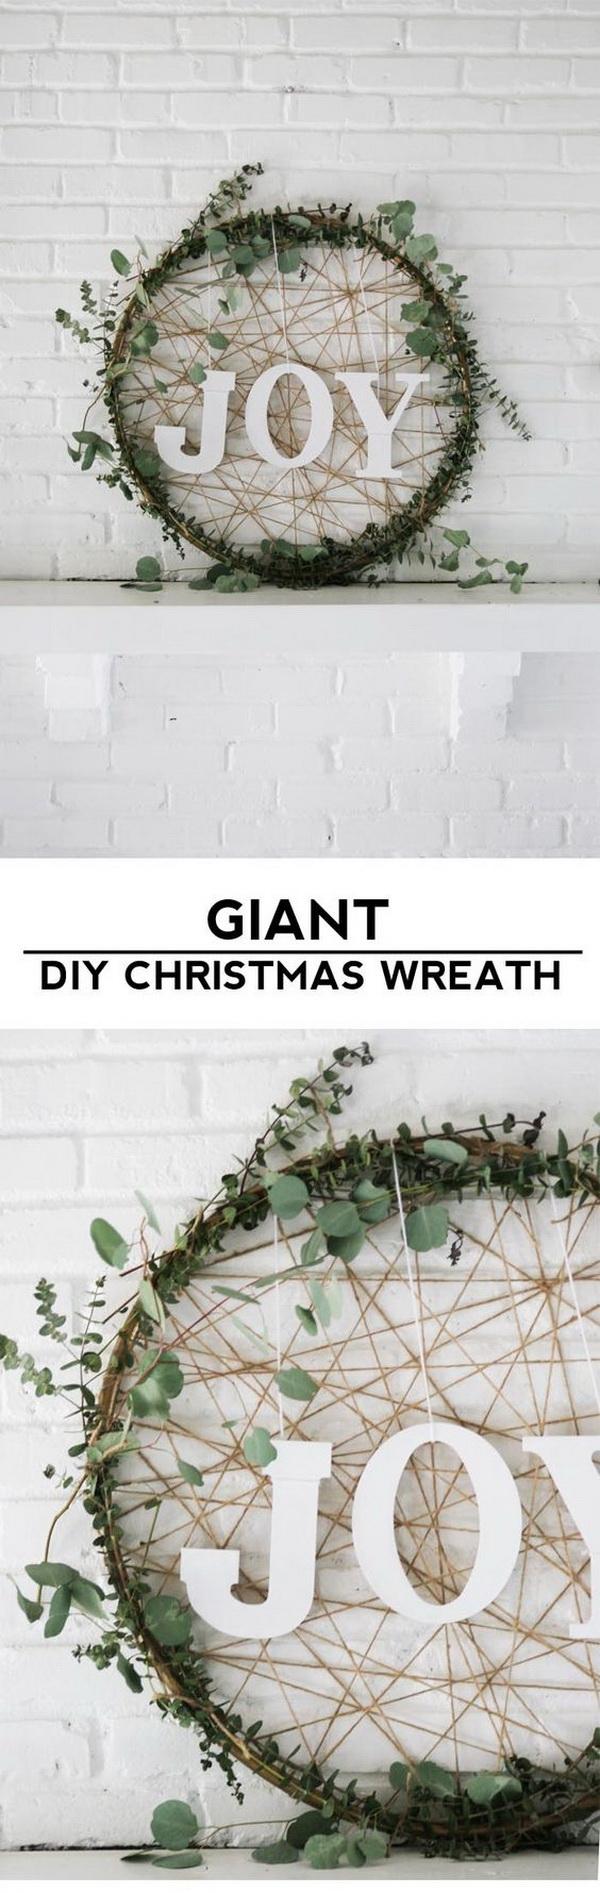 Giant Christmas Wreath.